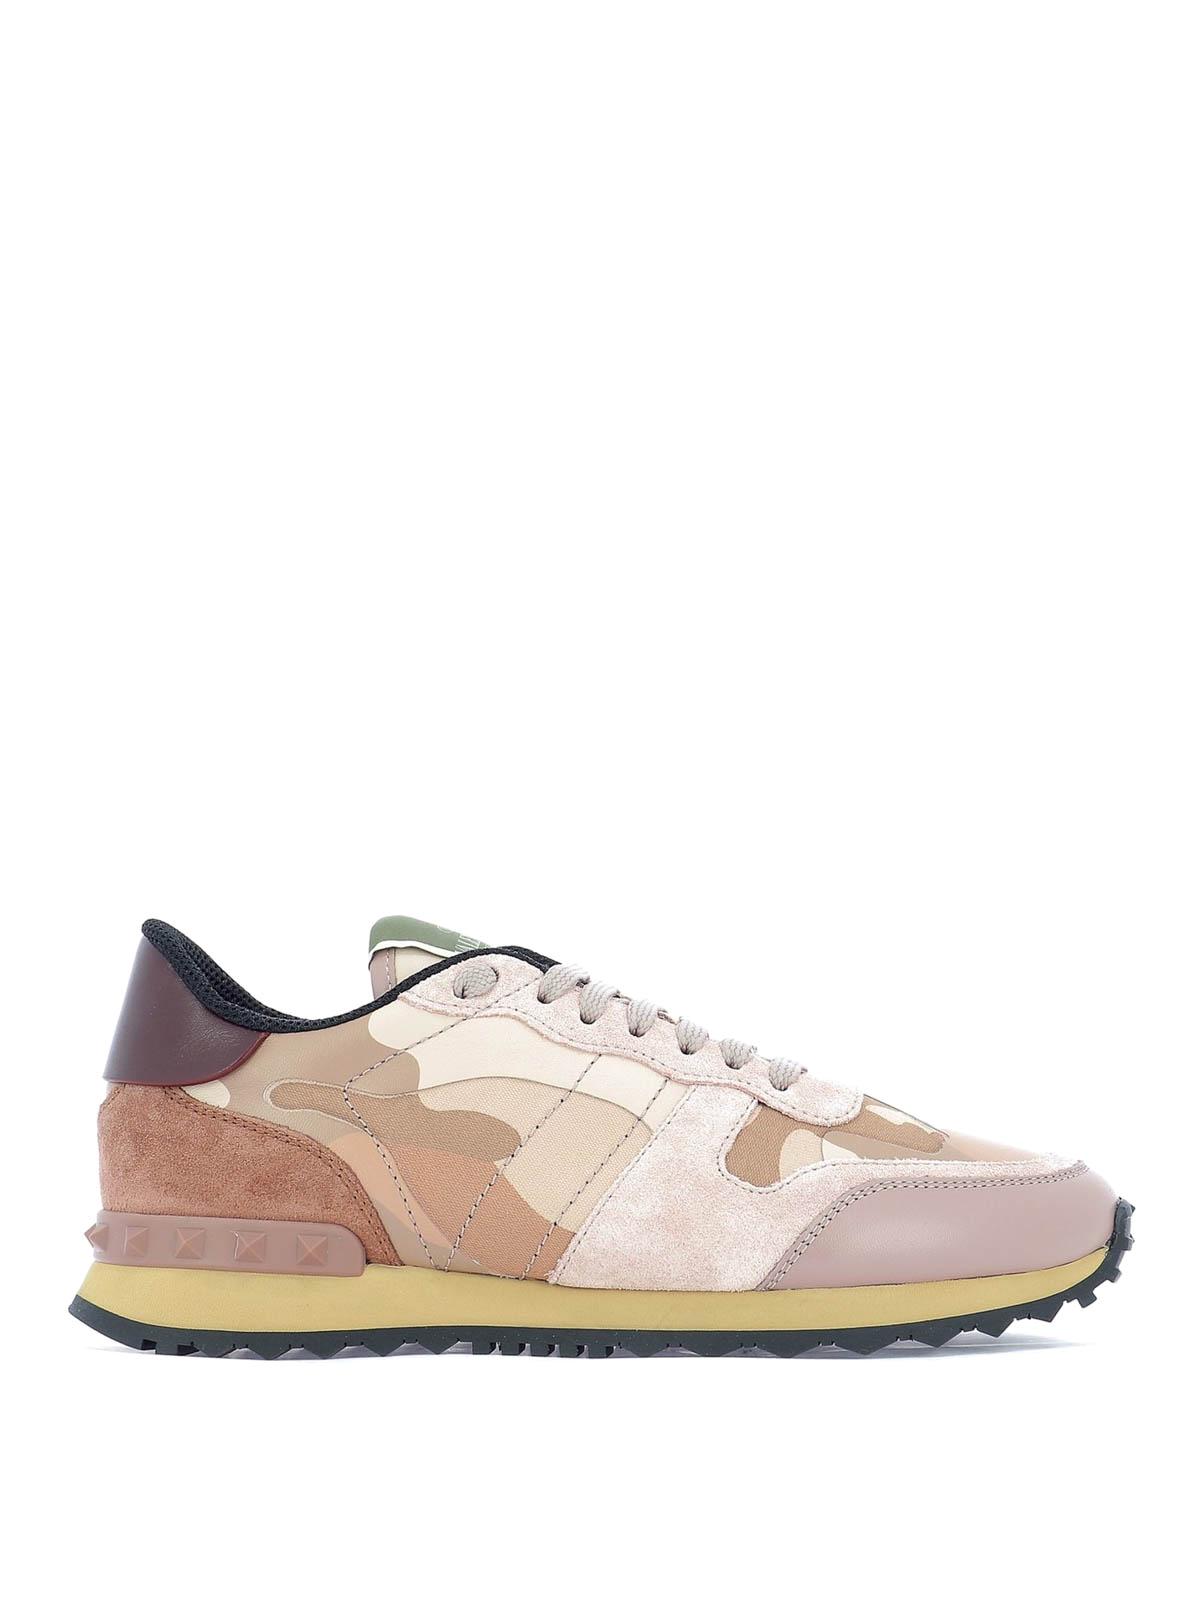 8df17961f88d2 VALENTINO GARAVANI: trainers - Rockrunner Camouflage low top sneakers